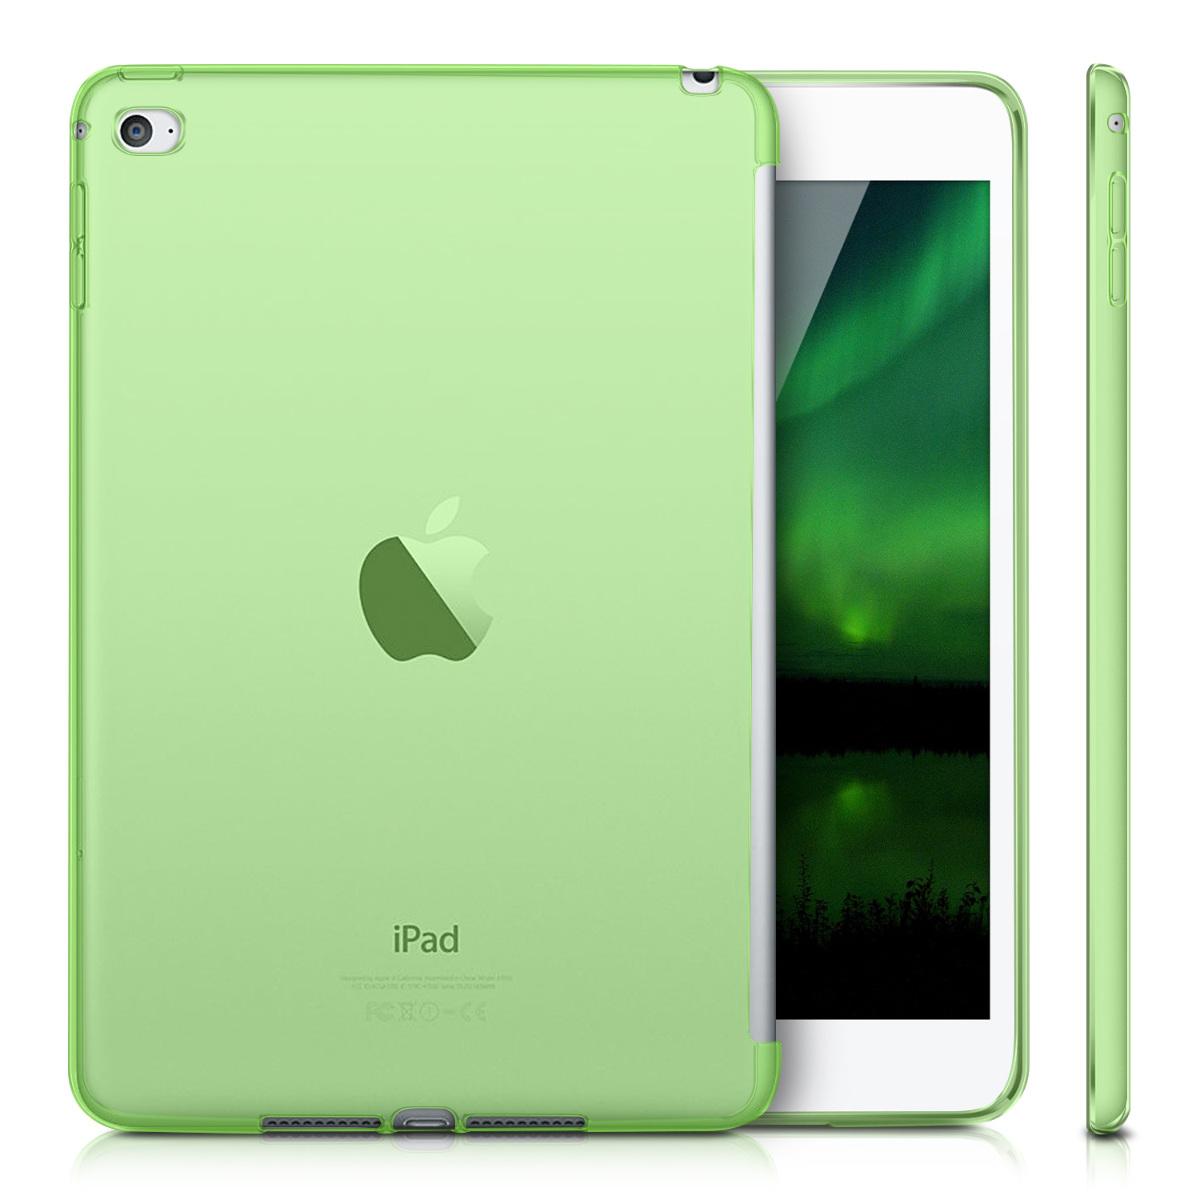 silicone case for apple ipad mini 4 smartcover compatible tpu case tablet cover ebay. Black Bedroom Furniture Sets. Home Design Ideas